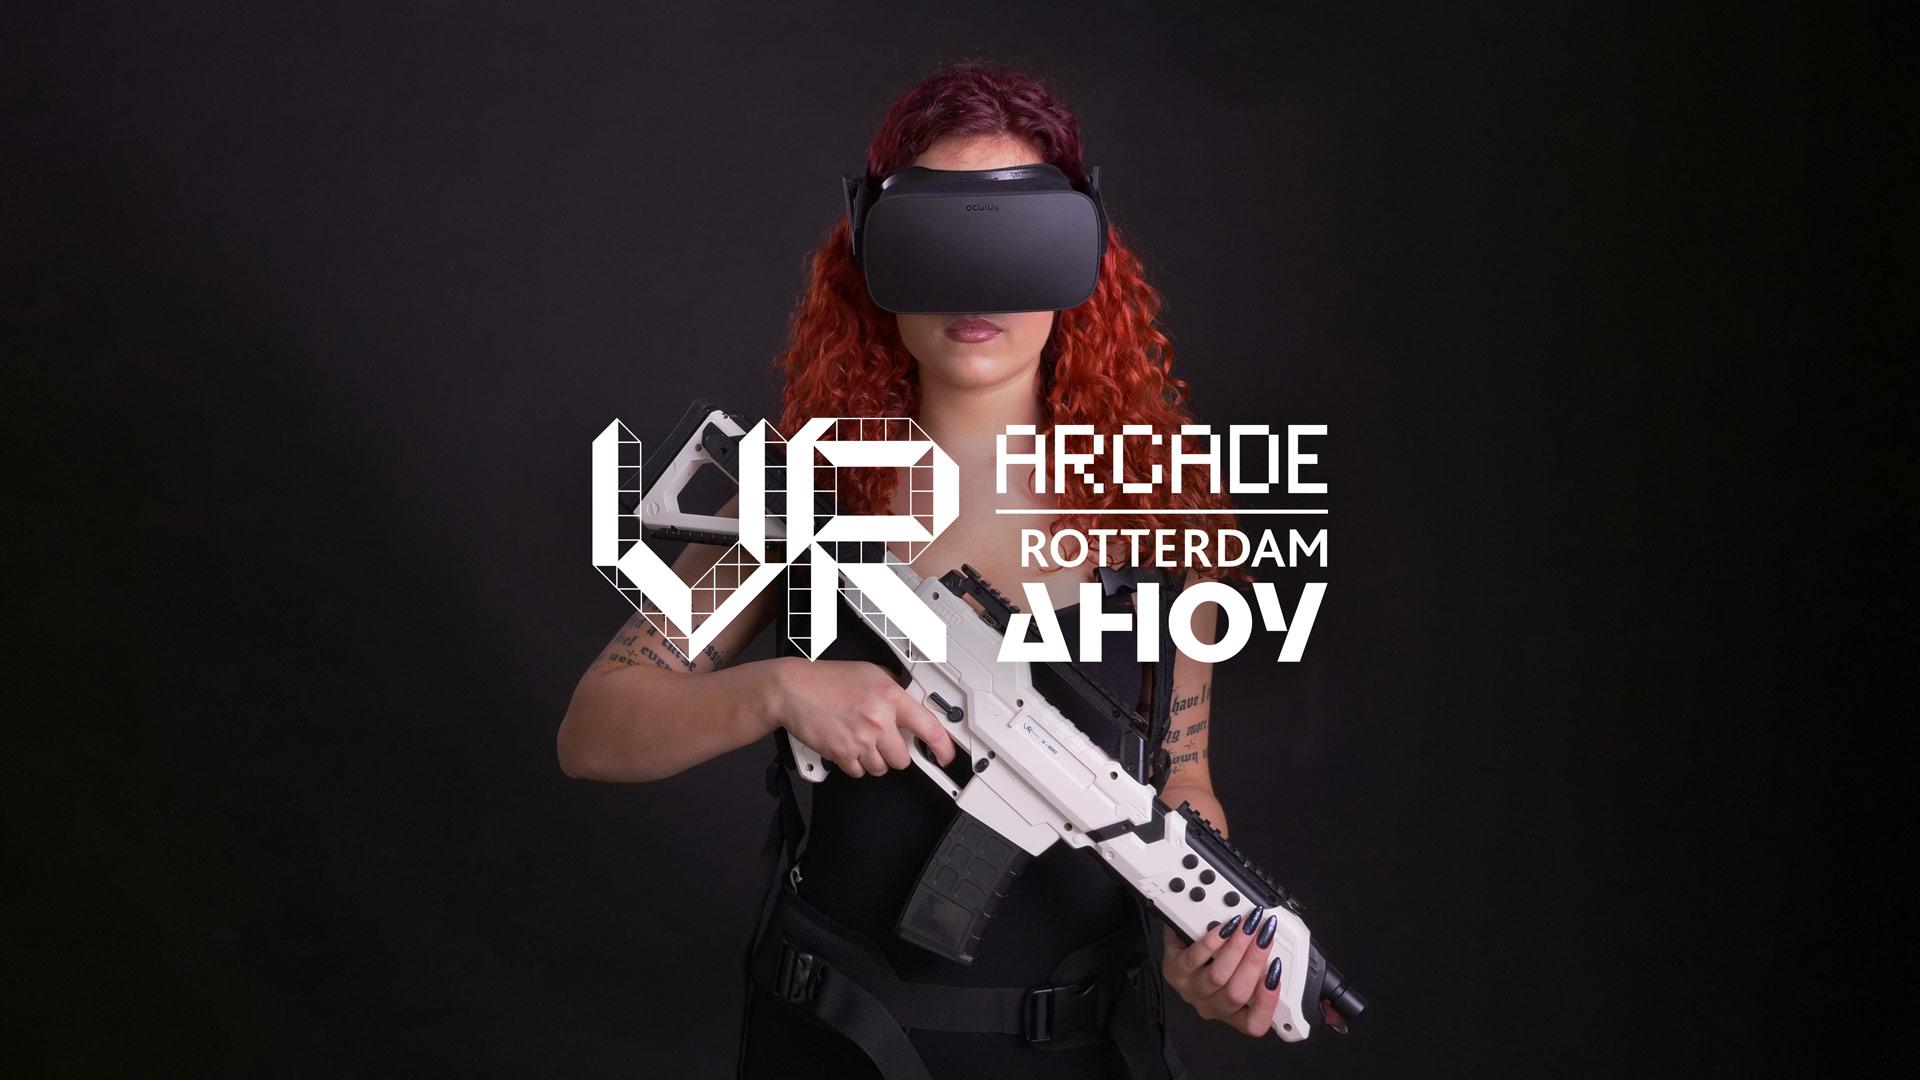 VR Arcade Rotterdam Ahoy